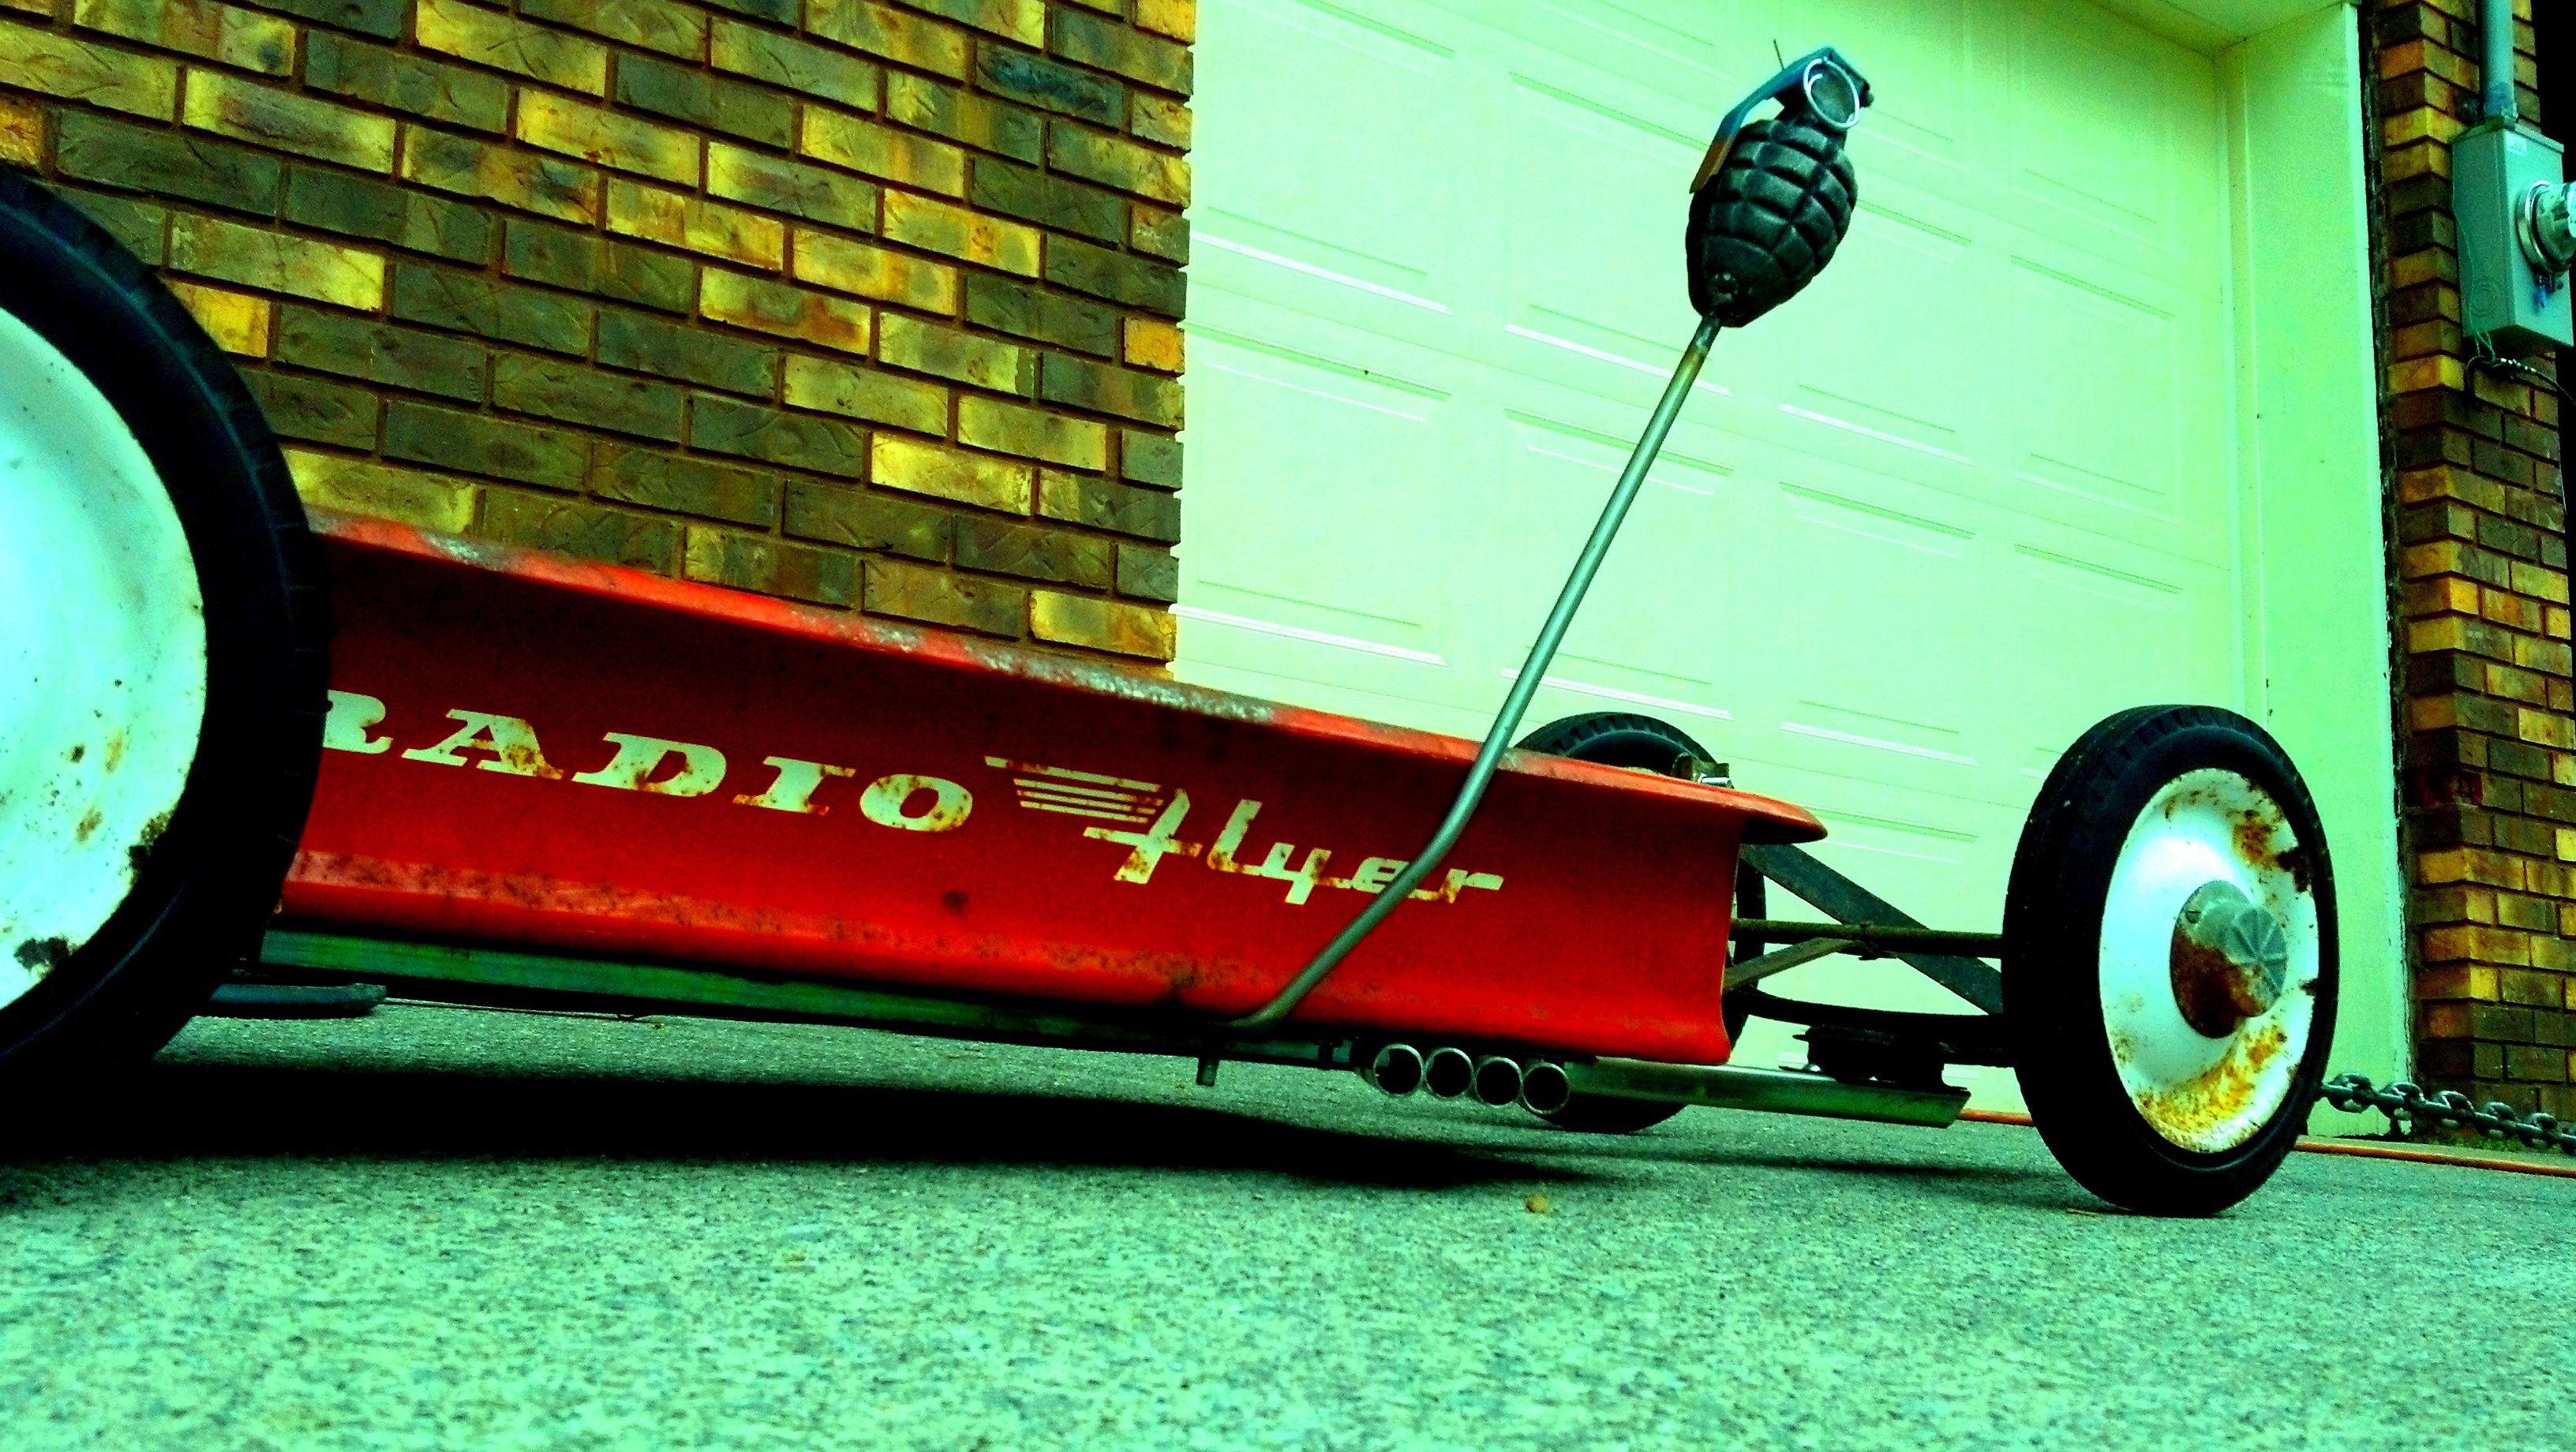 SIDE MUFFLER SIDE PIPE SET CUSTOM MAKE FOR RADIO FLYER WAGON